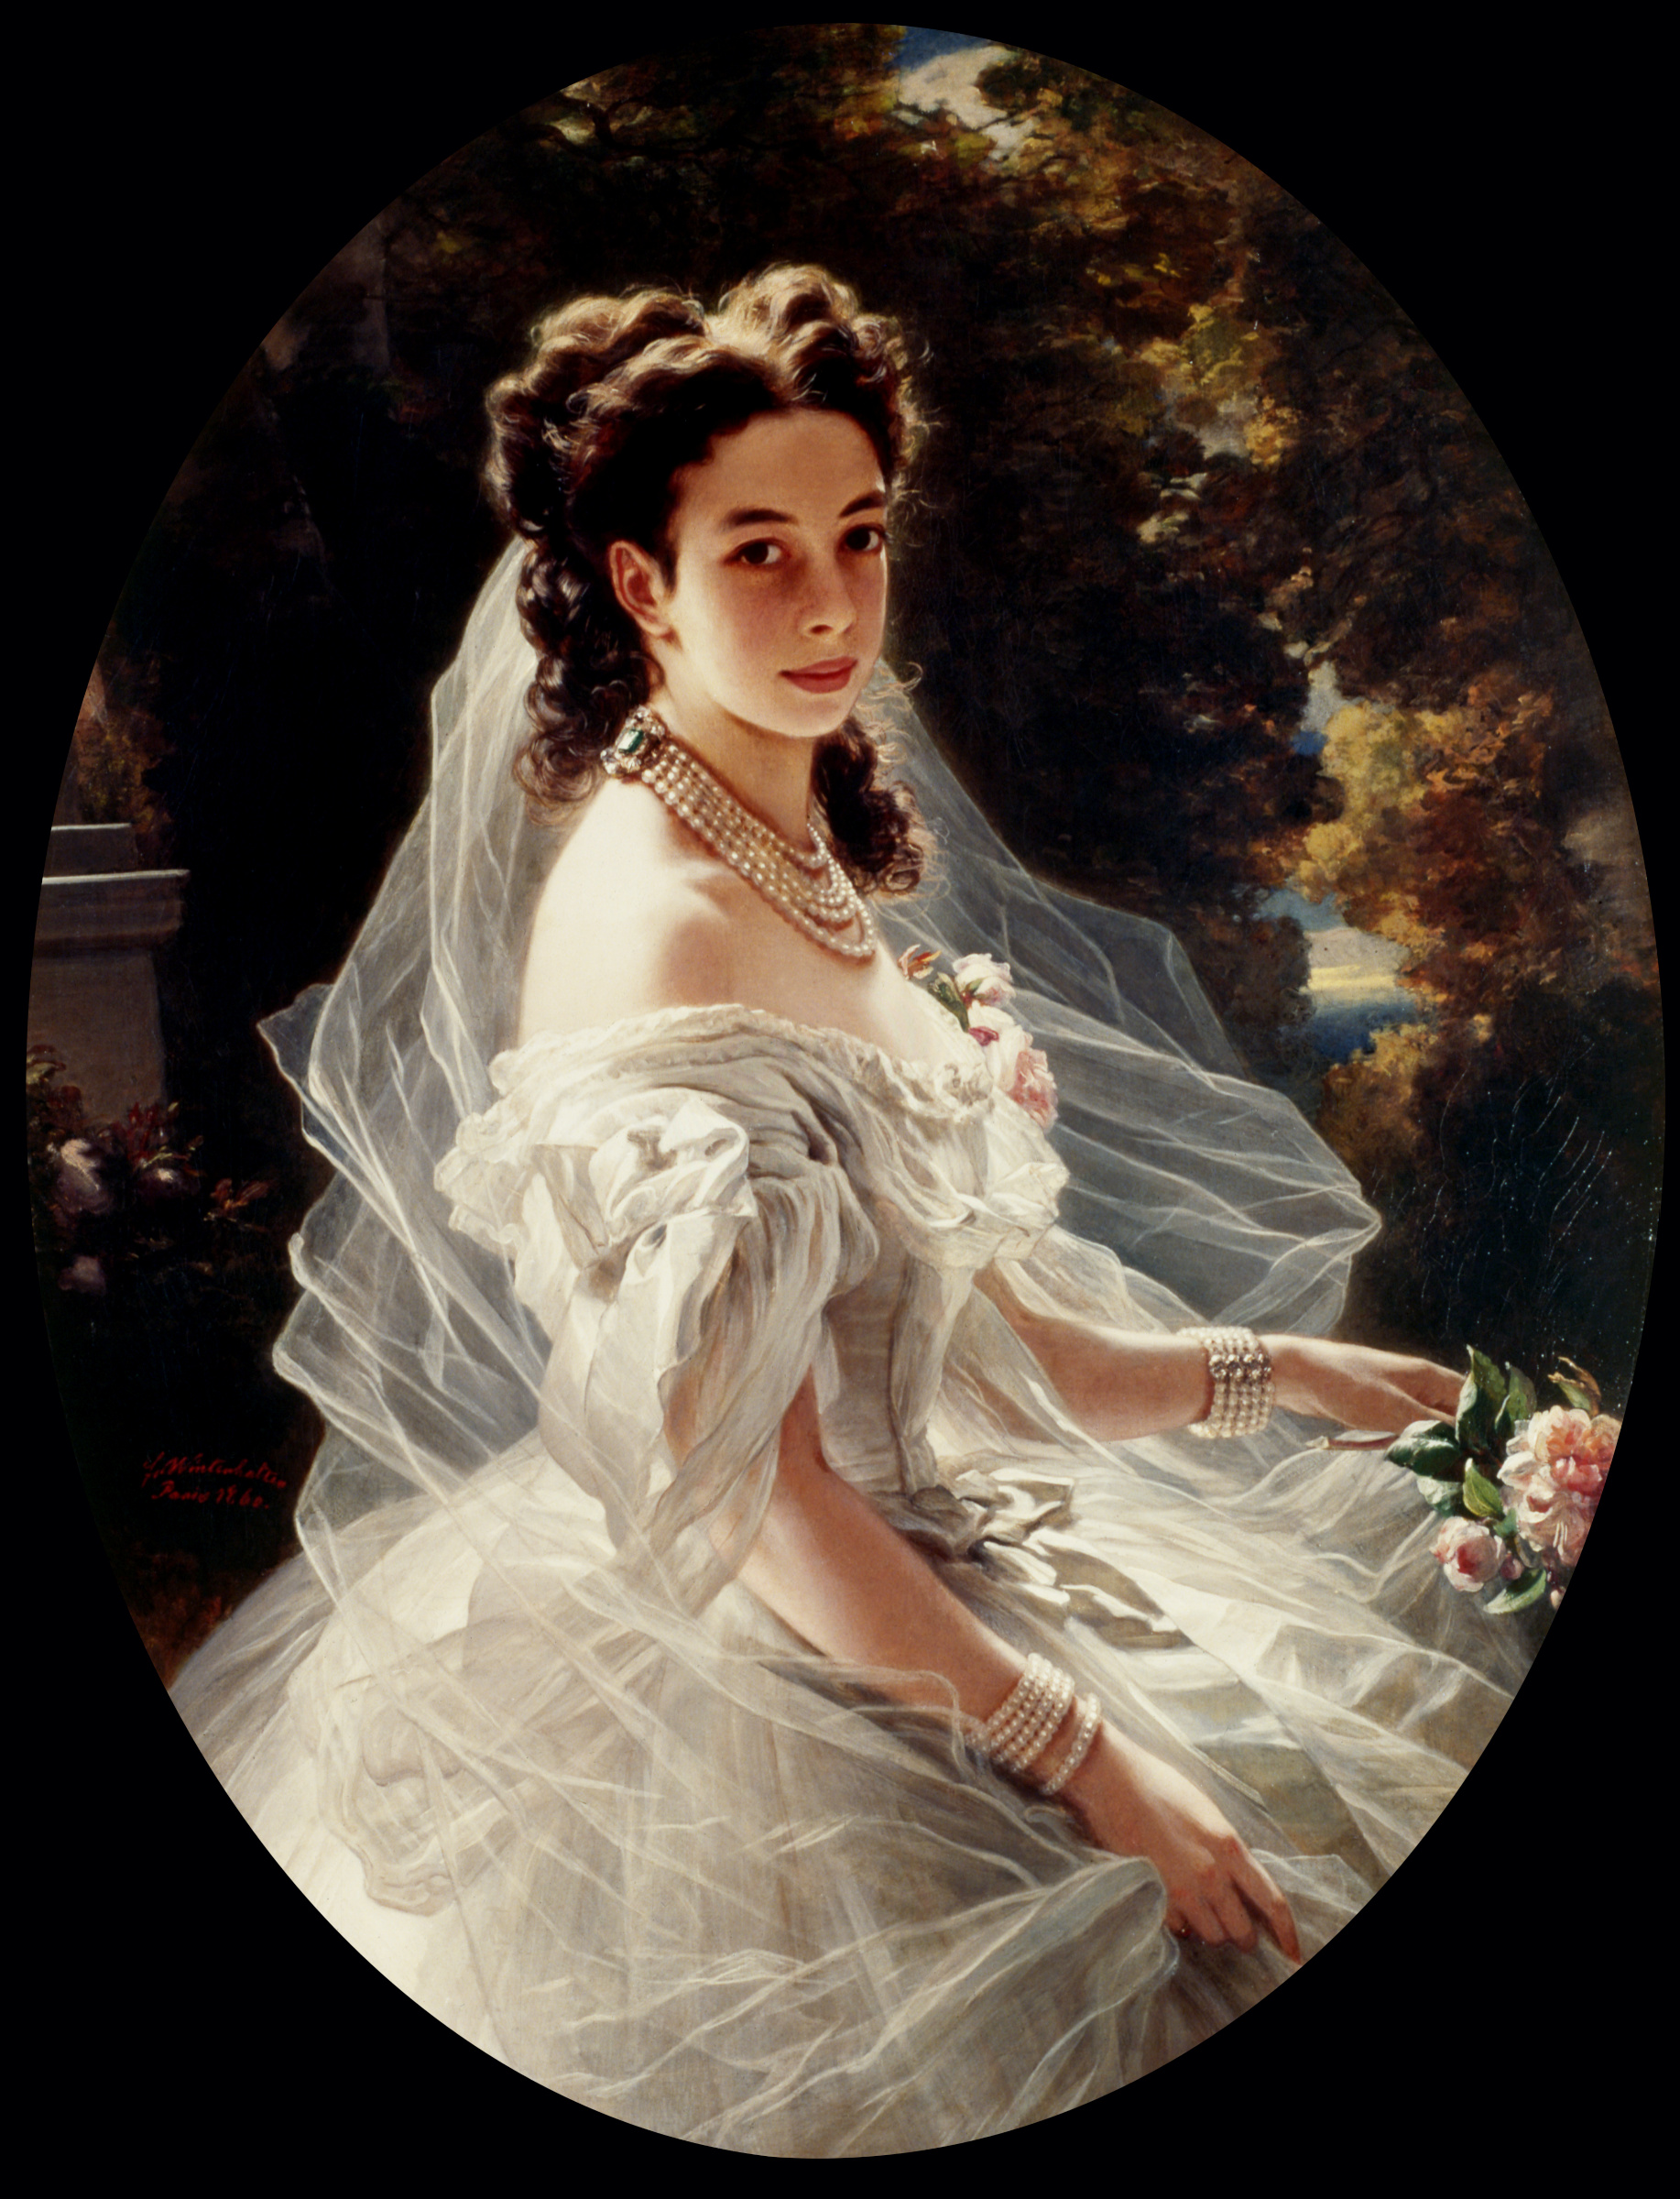 Franz X. Winterhalter, Pauline Sándor, Princess Metternich, 1860, oil on canvas, private collection.